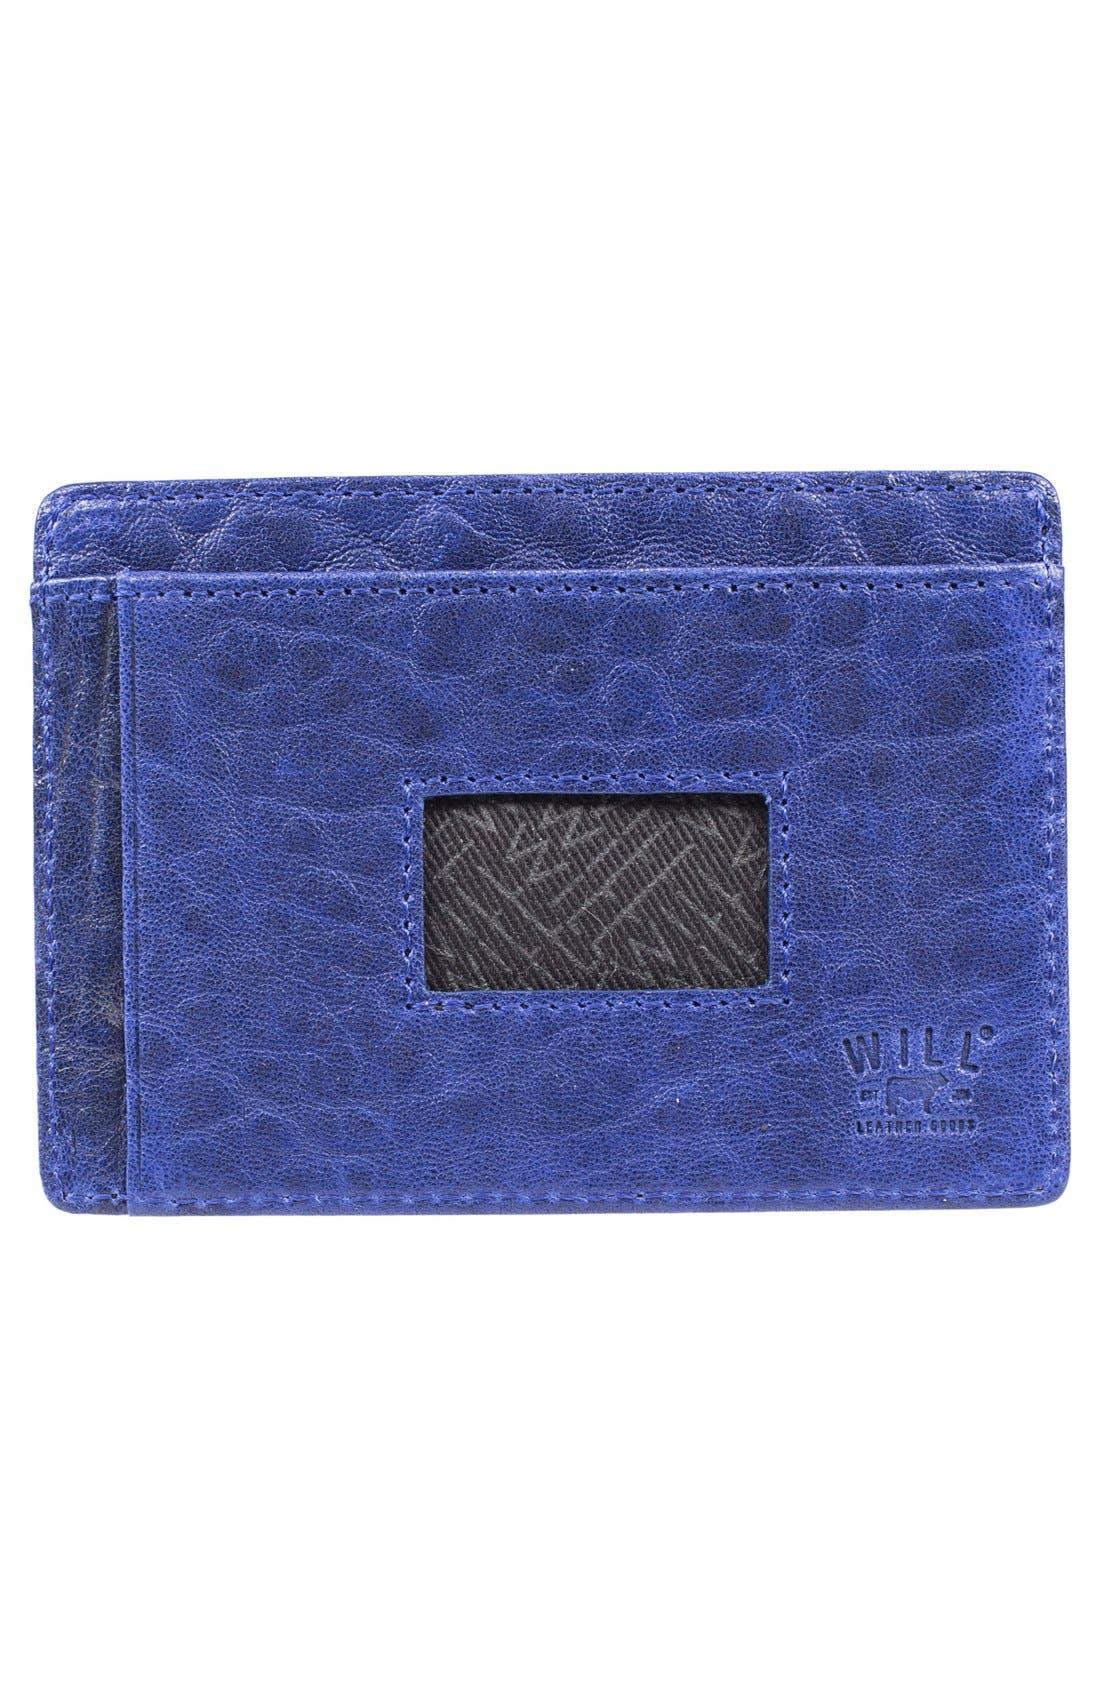 'Quip' Leather Card Case,                             Alternate thumbnail 4, color,                             012